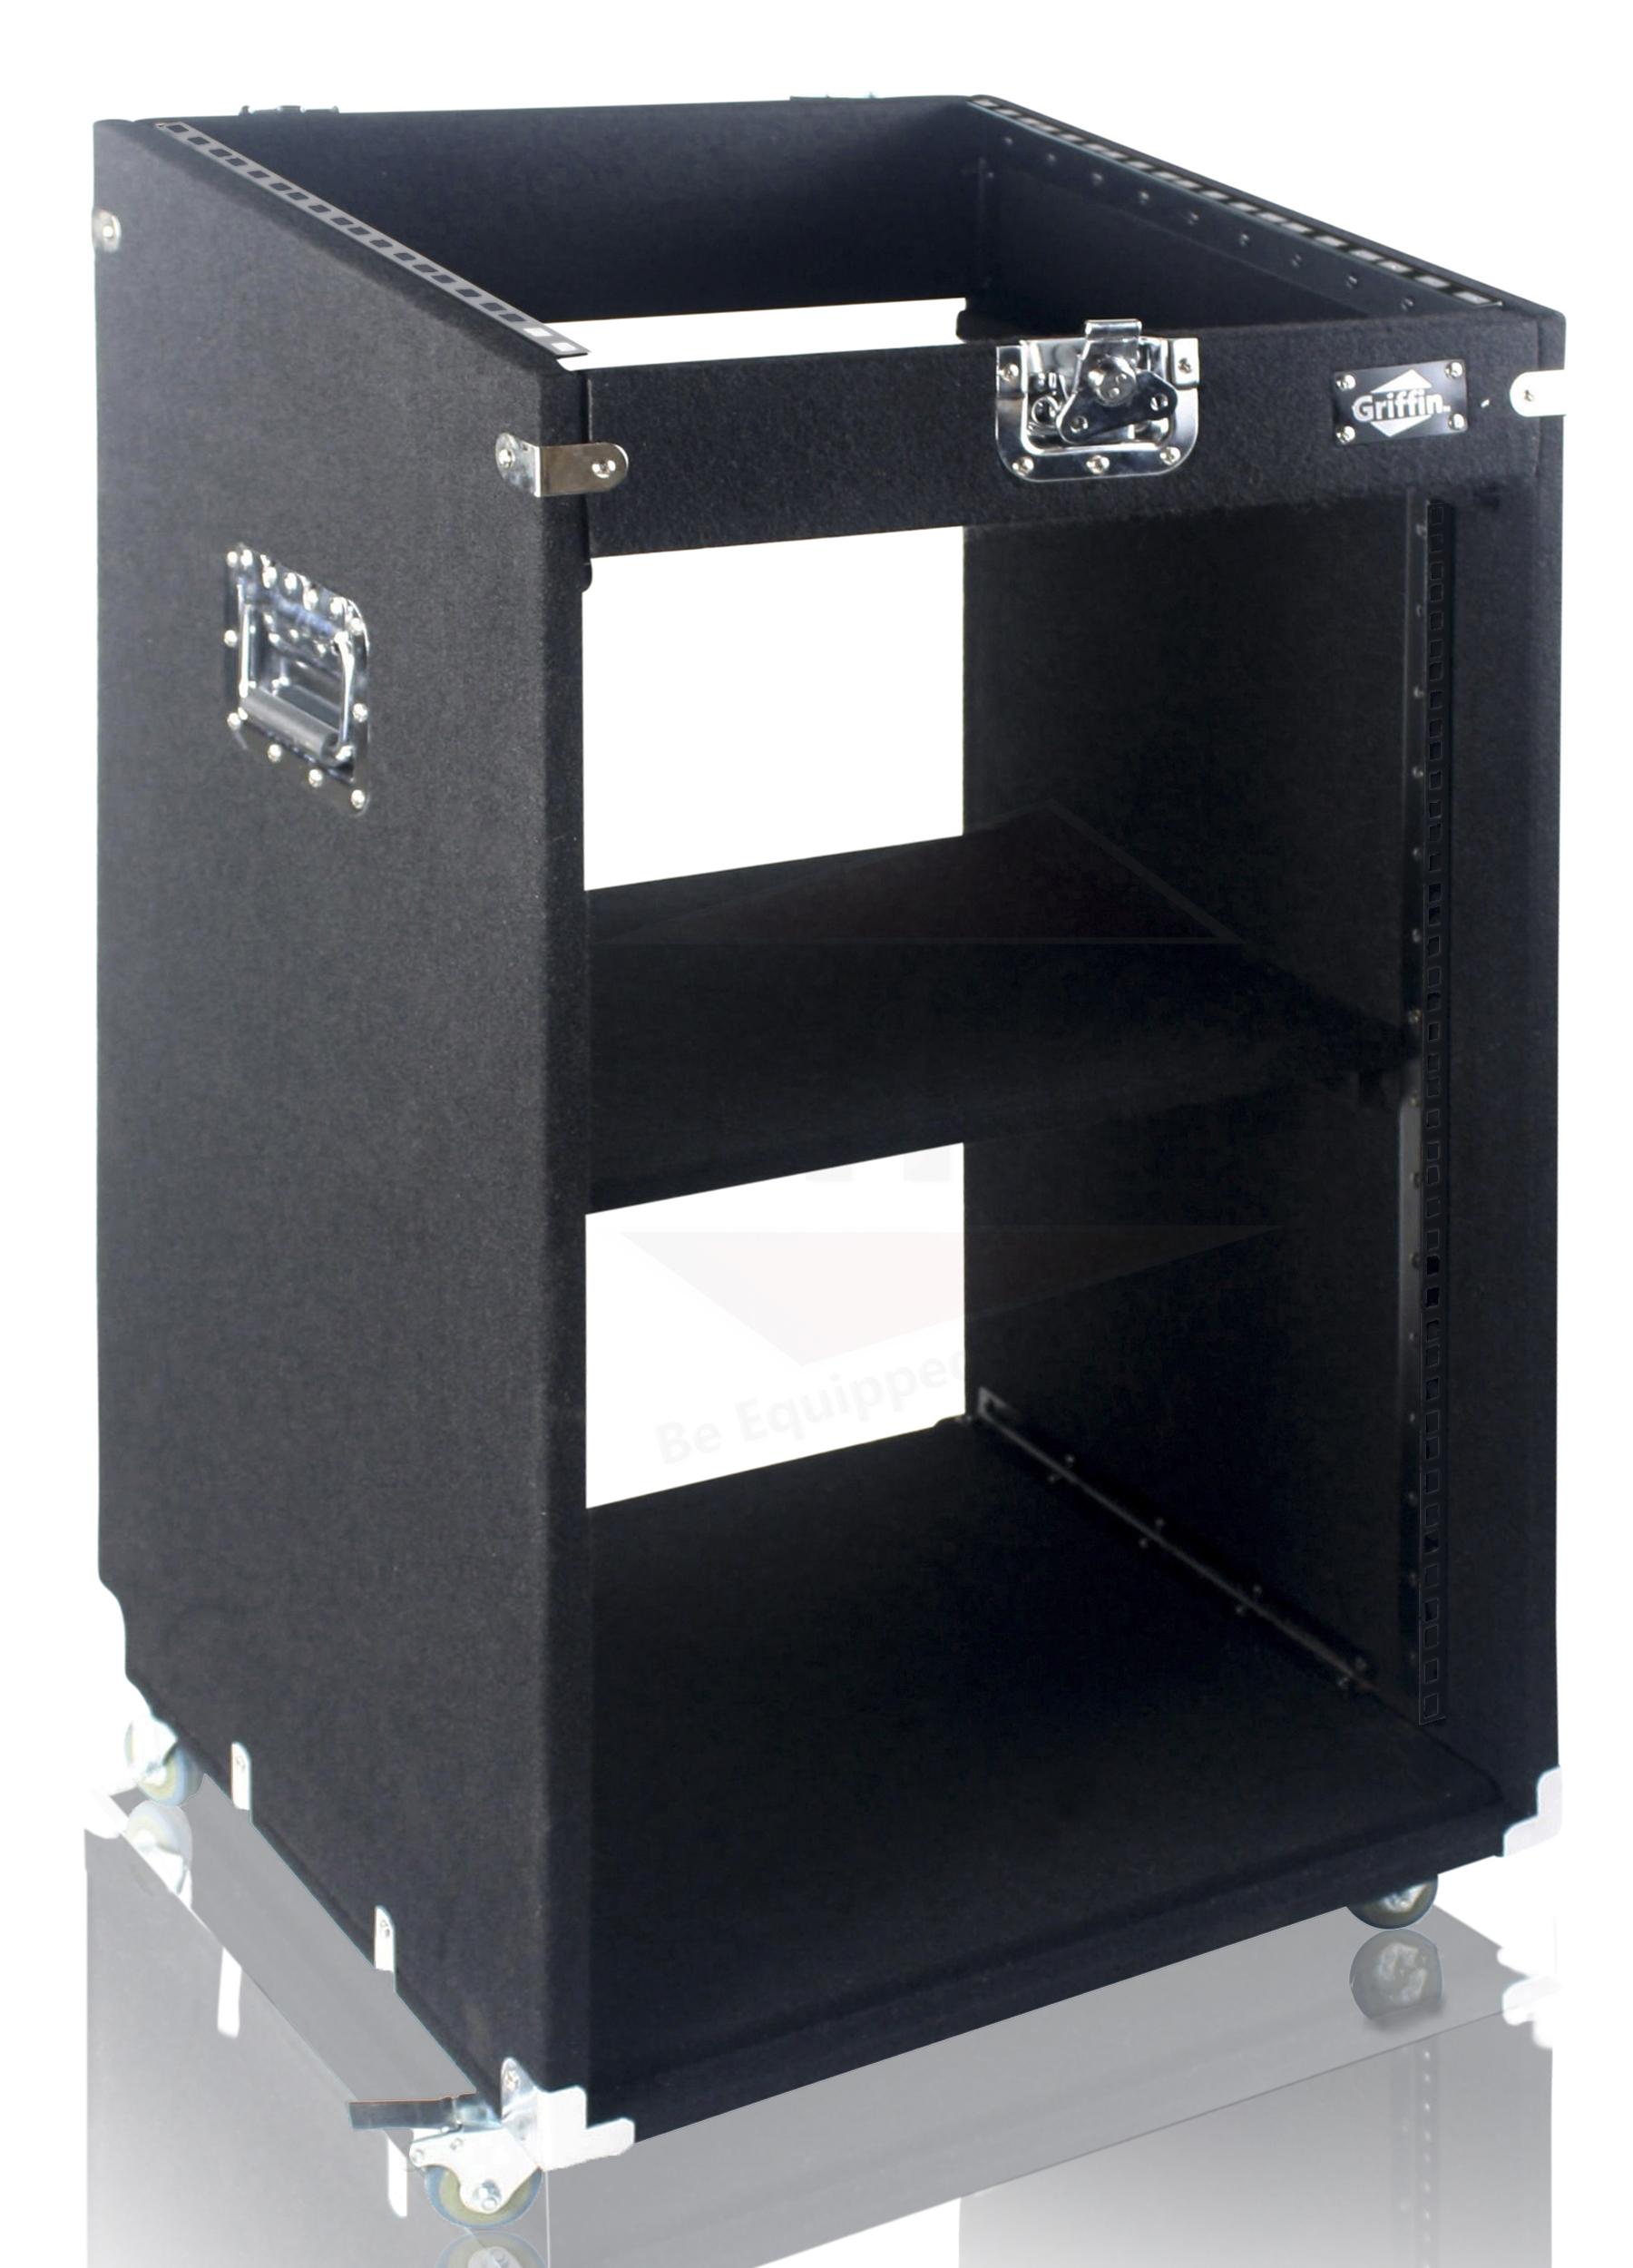 Rack Mount Cabinet Flight Case Studio Mixer Dj Pa Cart